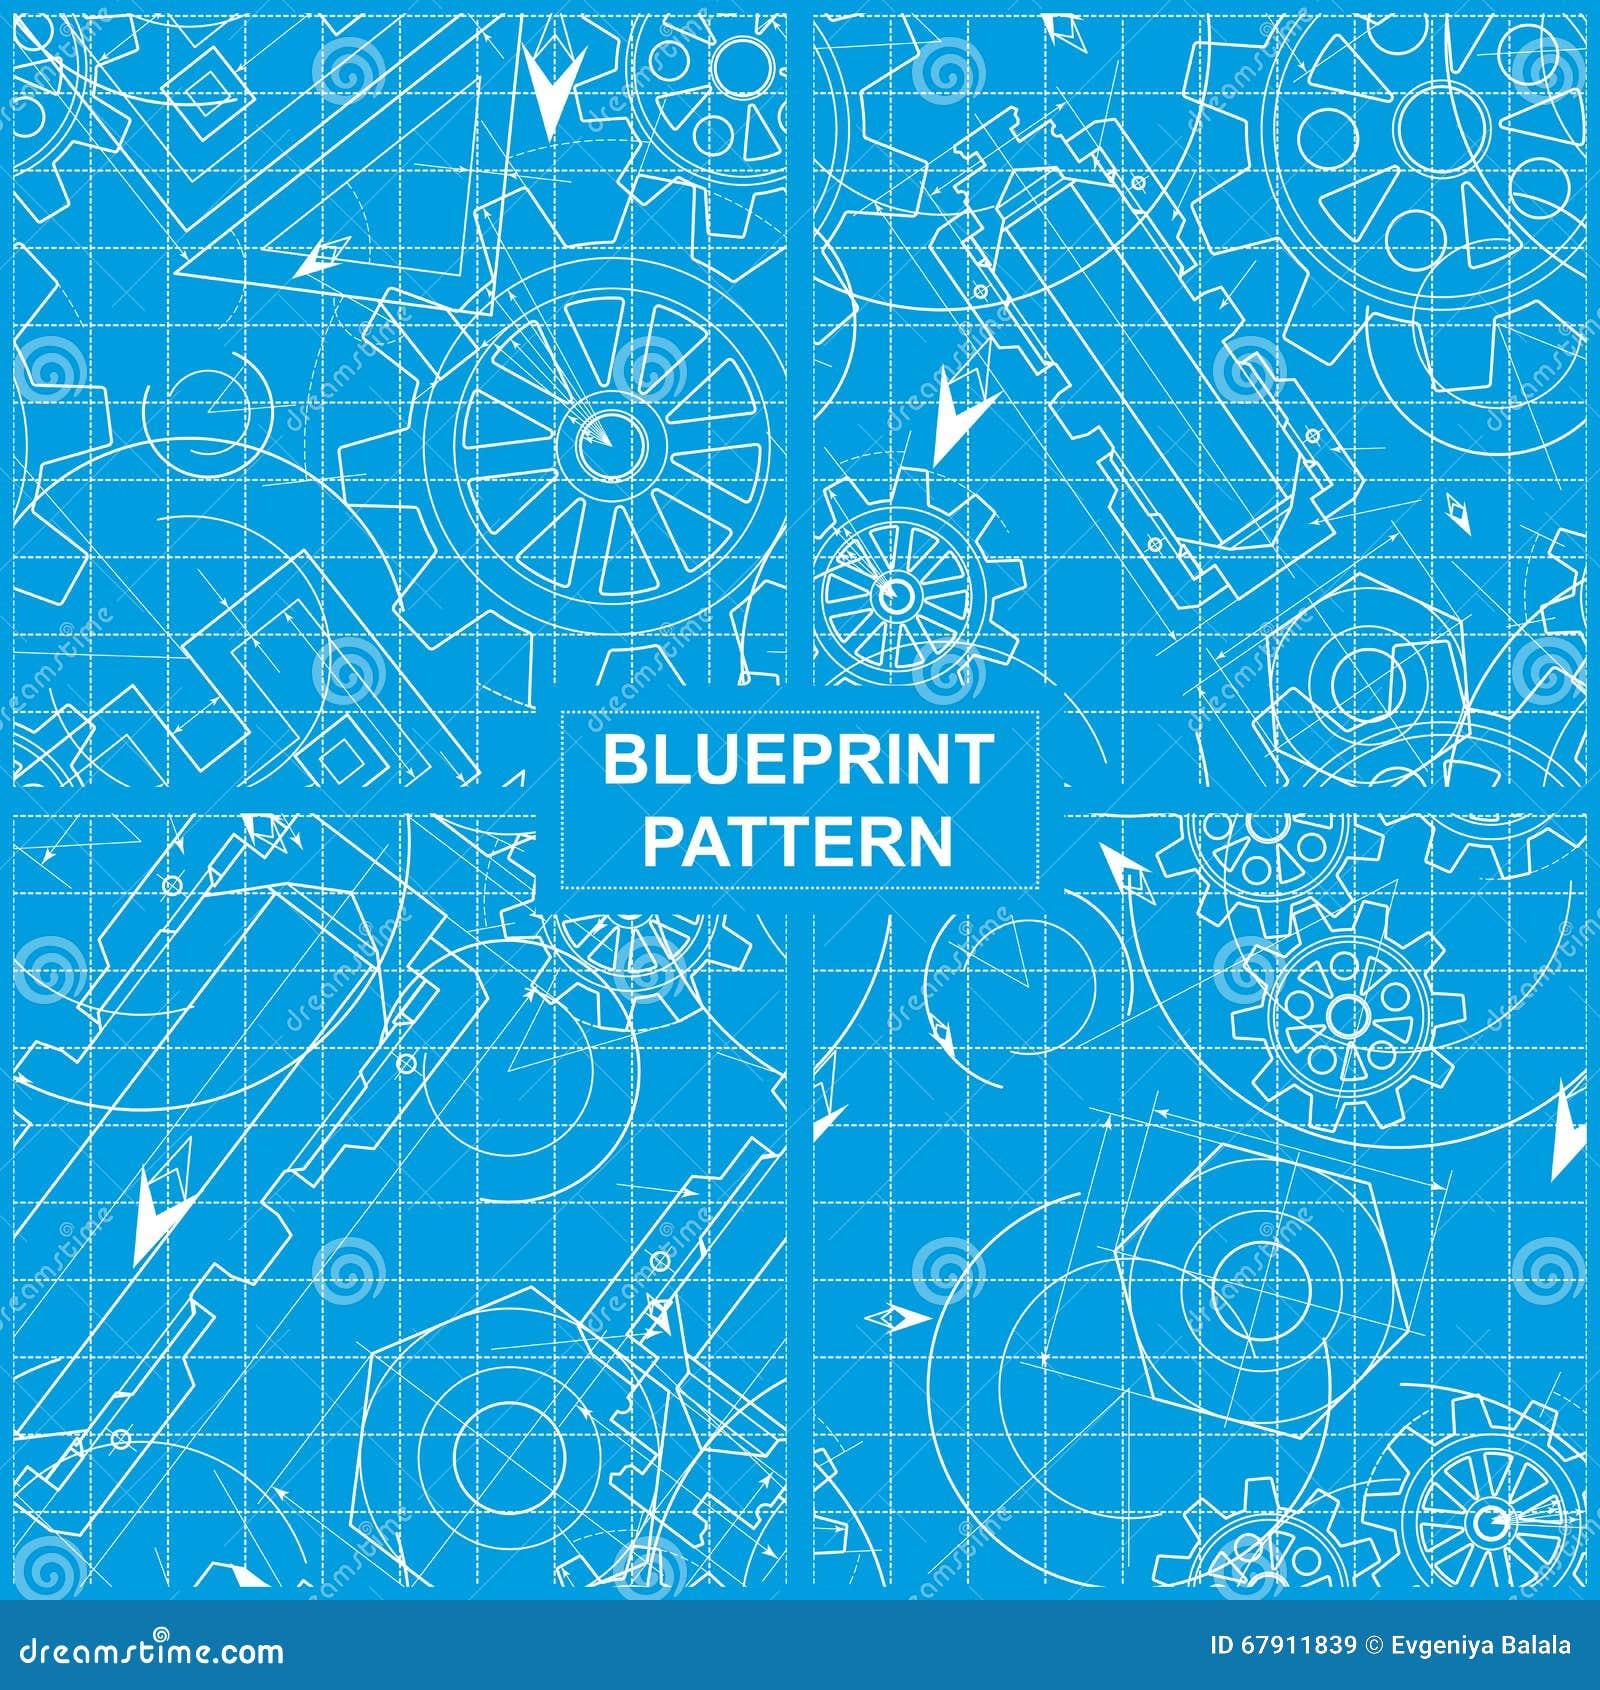 Blueprint pattern stock vector illustration of architecture blueprint pattern malvernweather Images